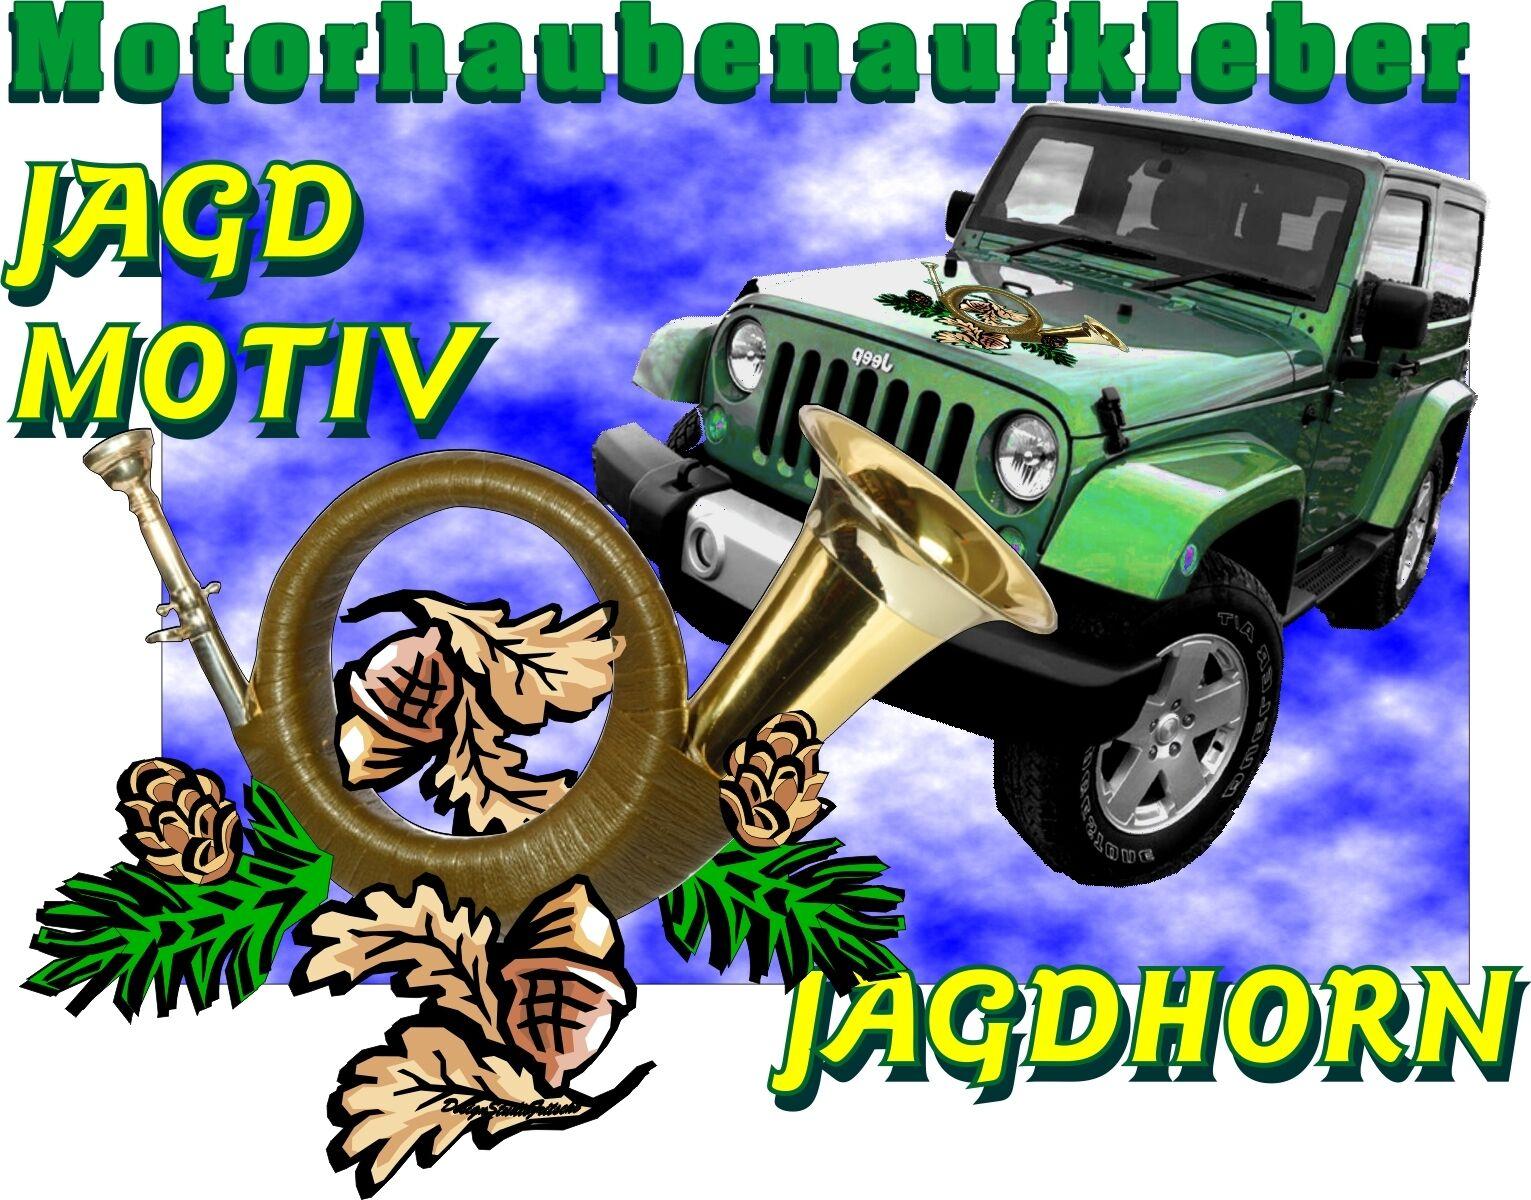 Sticker Sticker Sticker Motorhauber Auto Caravan Truck Suzuki Jeep SUV Wild Jagd Motiv  Jagdhorn 79f33d